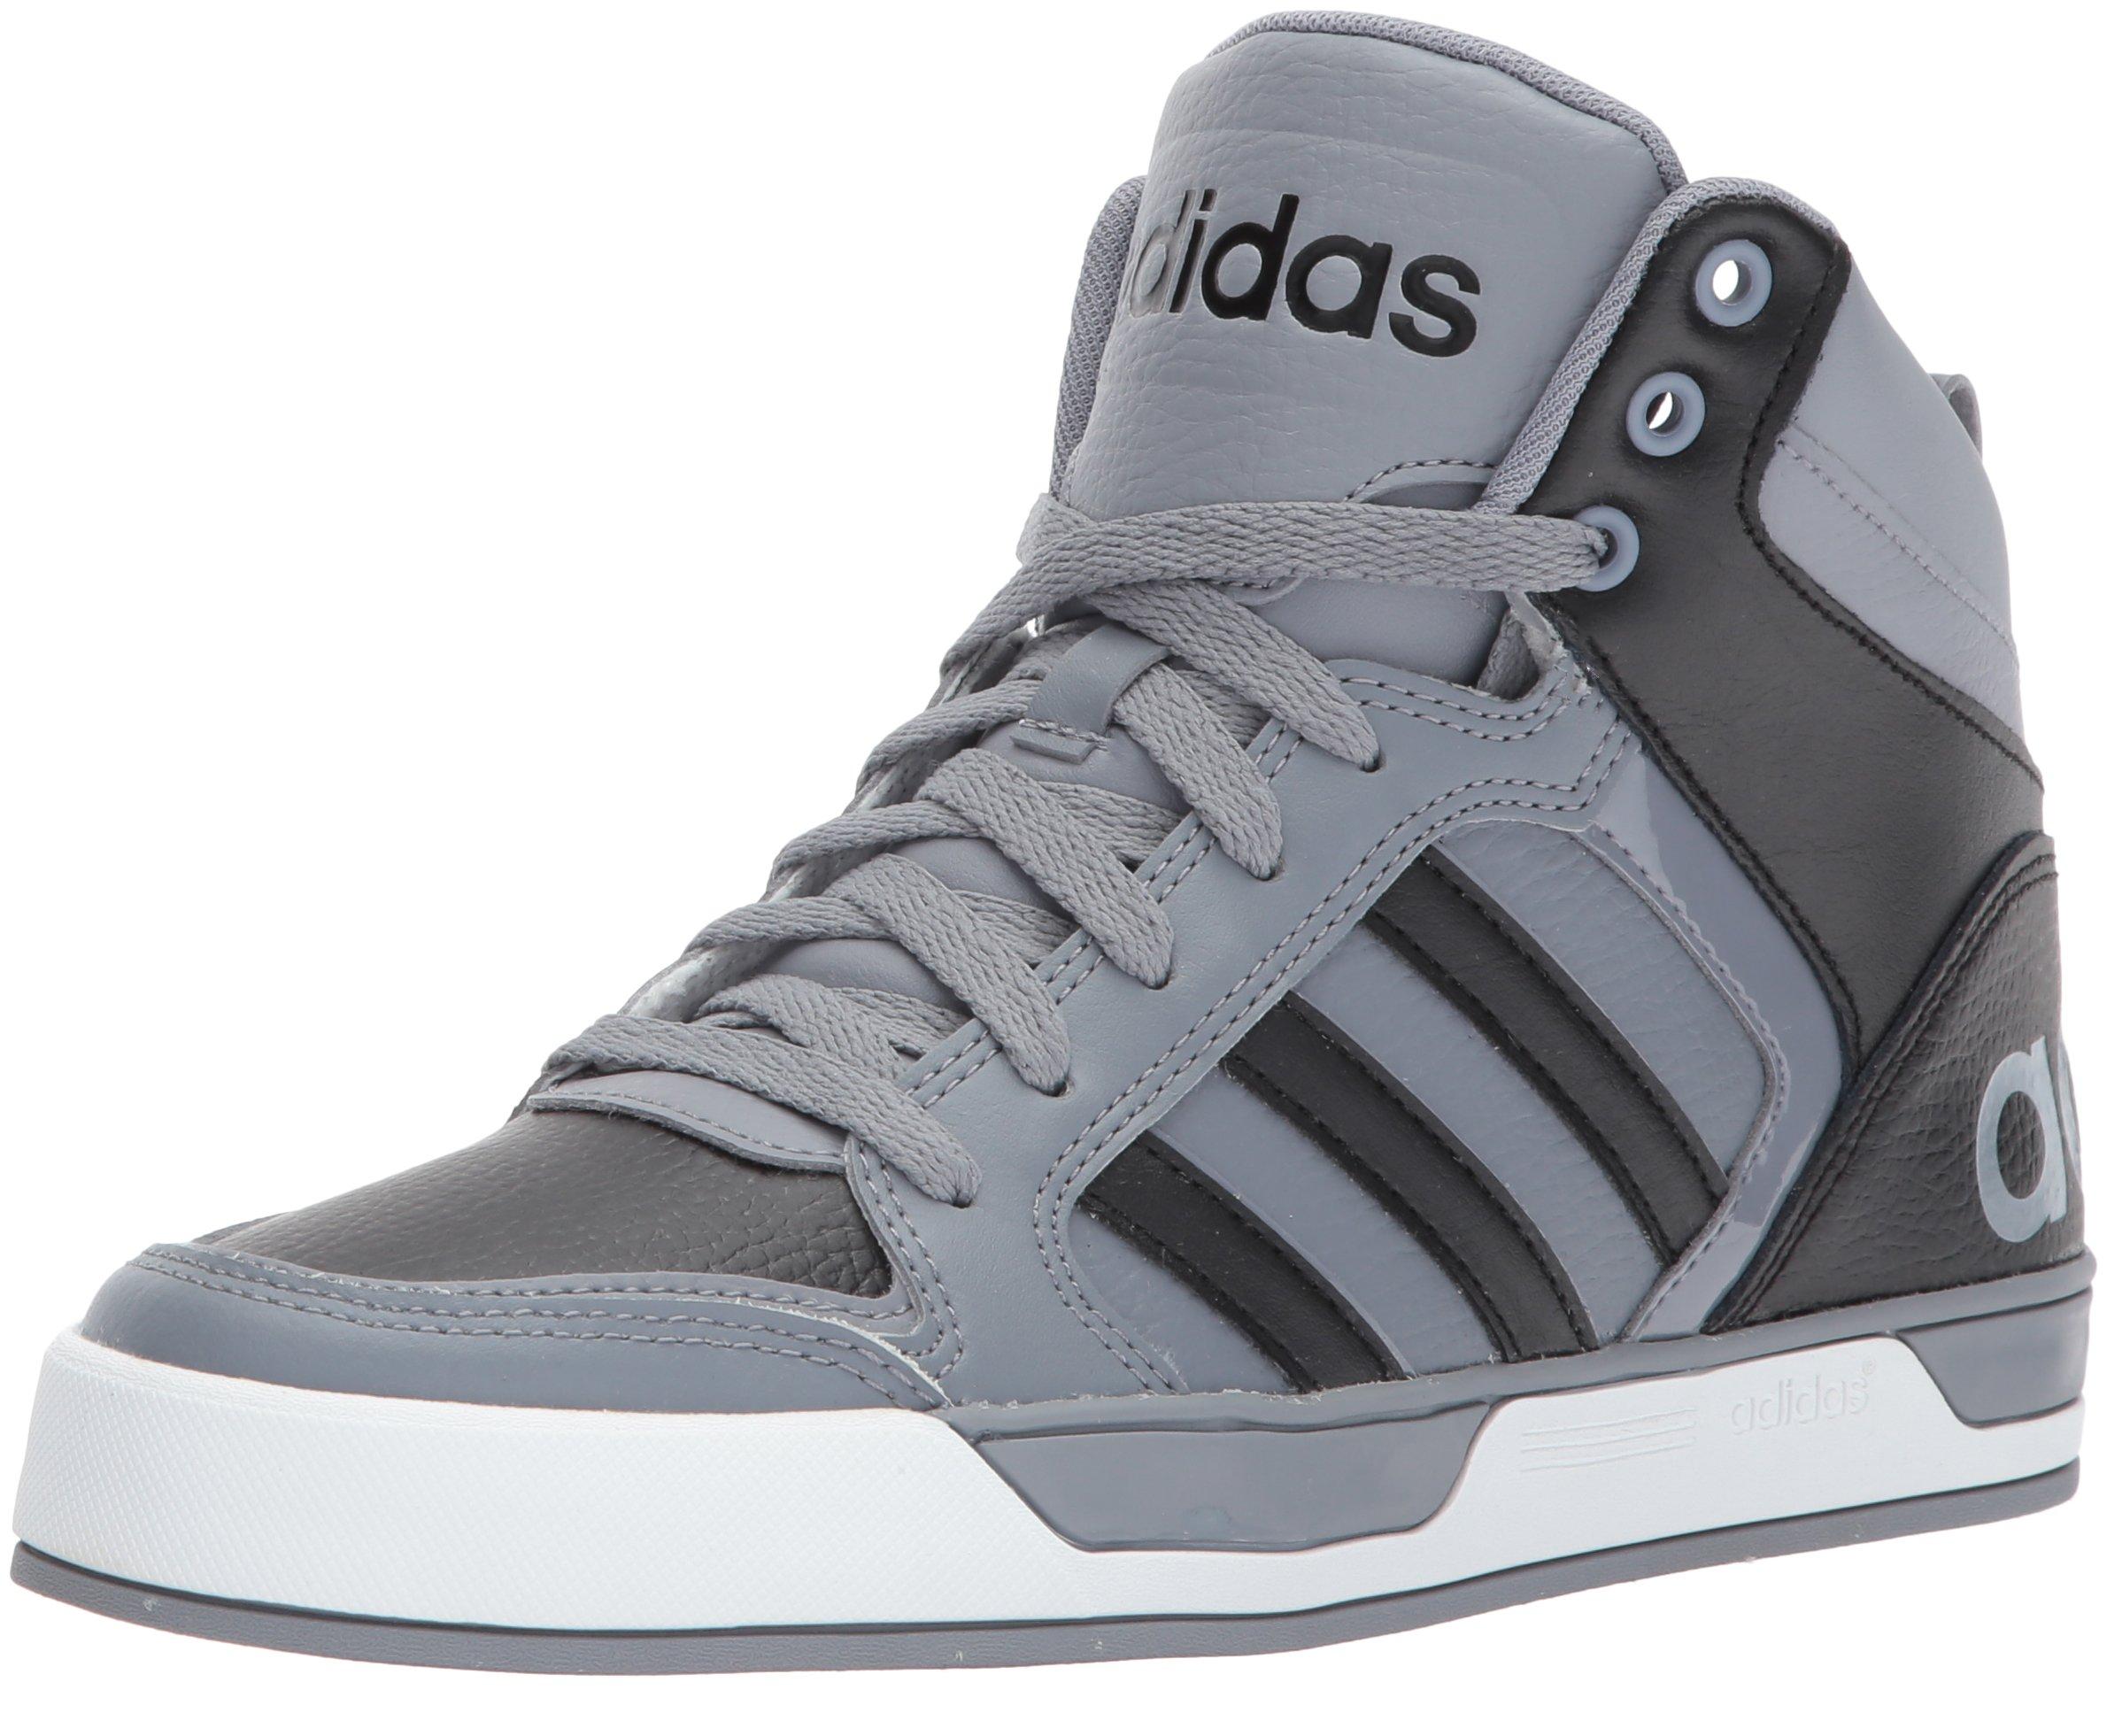 Raleigh 9TIS MID Sneaker, Grey